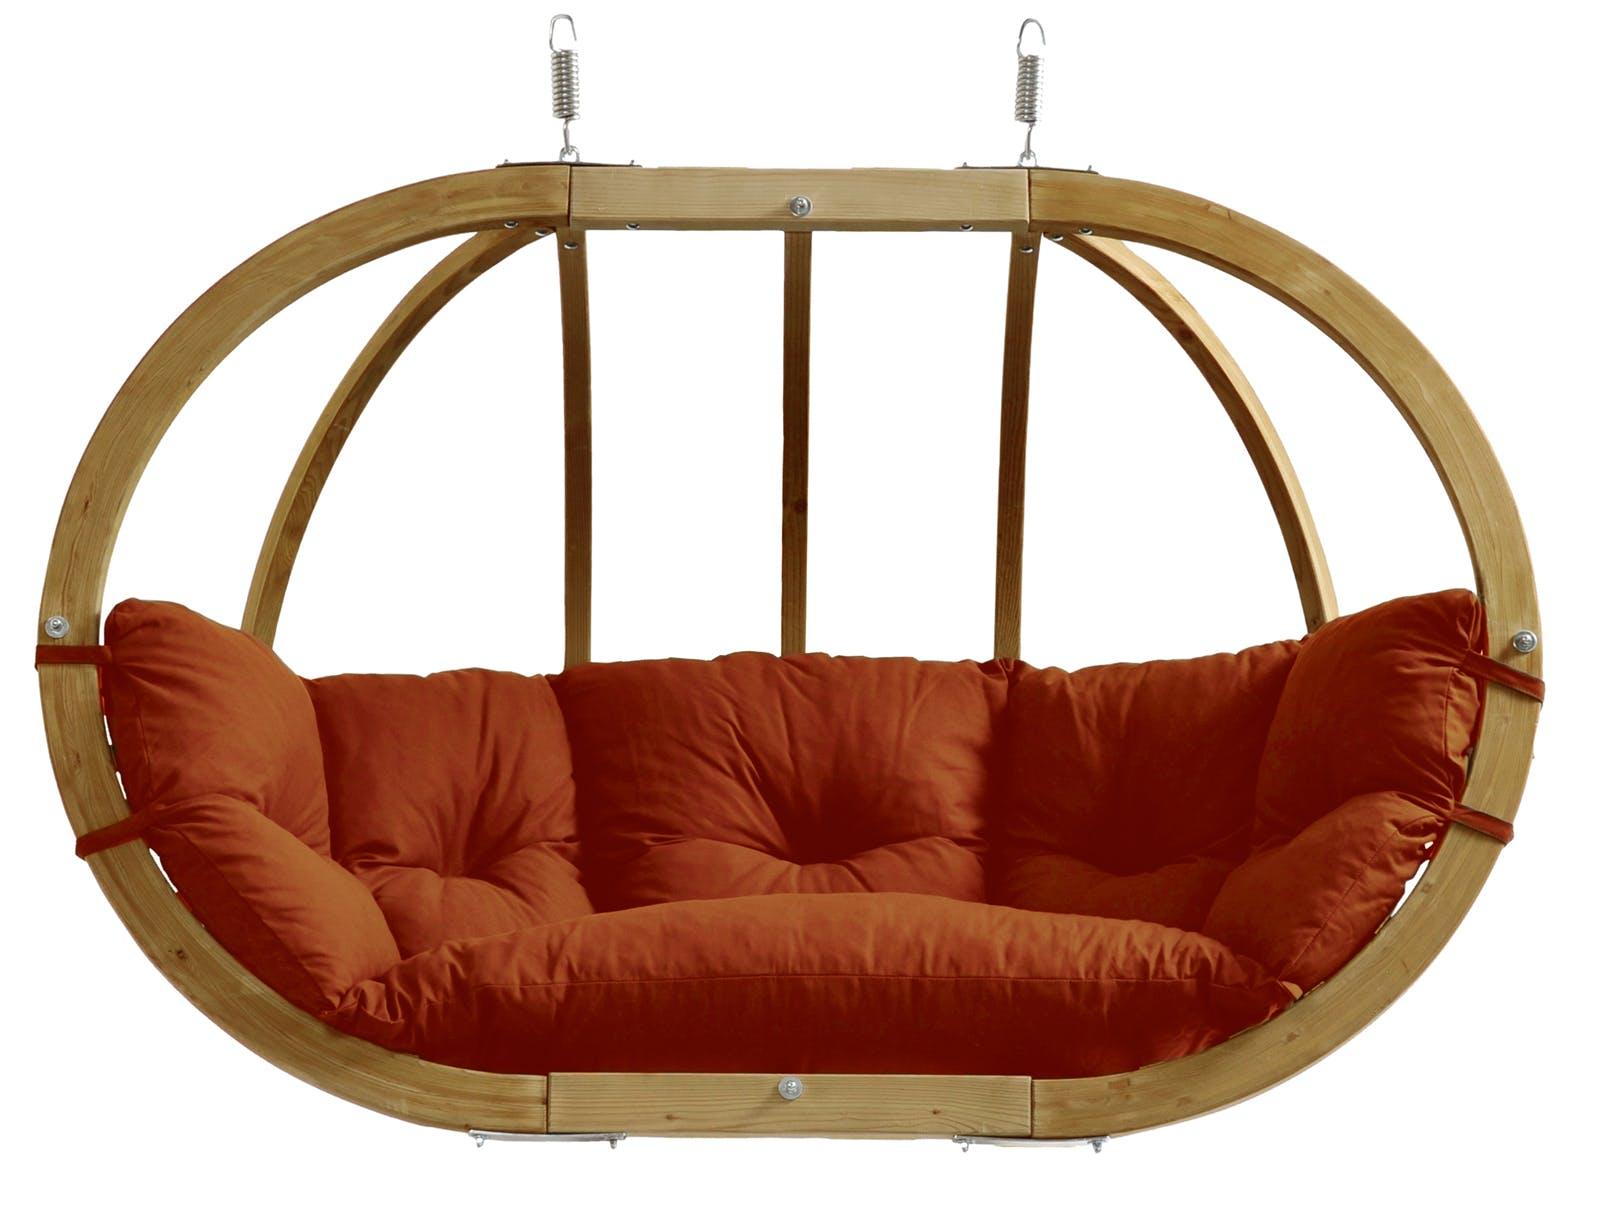 Fauteuil suspendu Globo Royal Chair Terracotta 176x118x72cm AMAZONAS